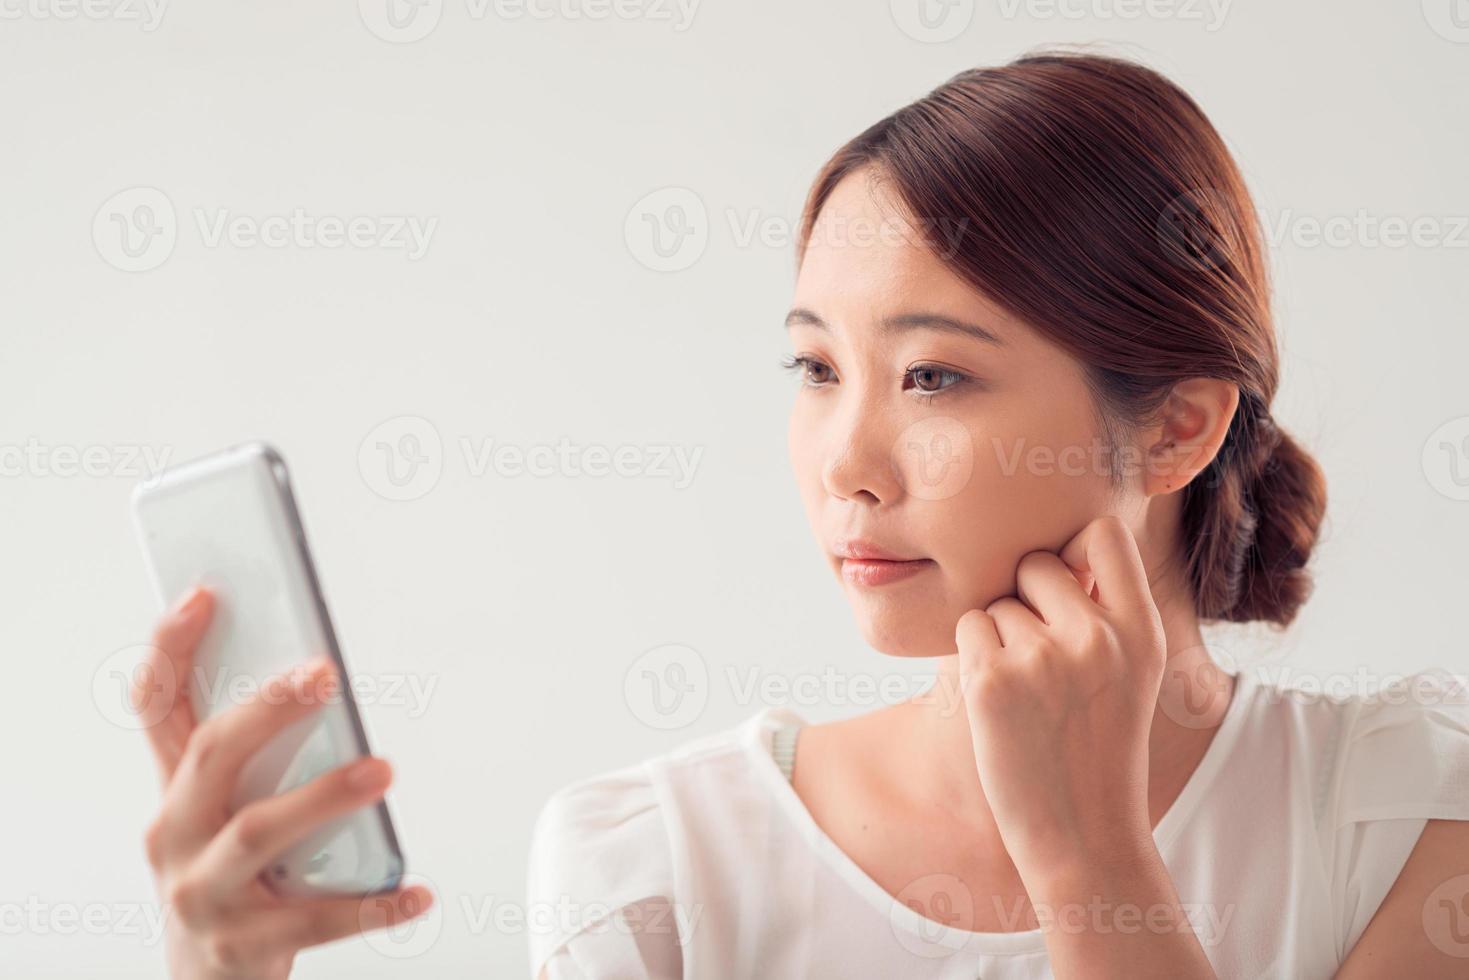 femme pensive photo